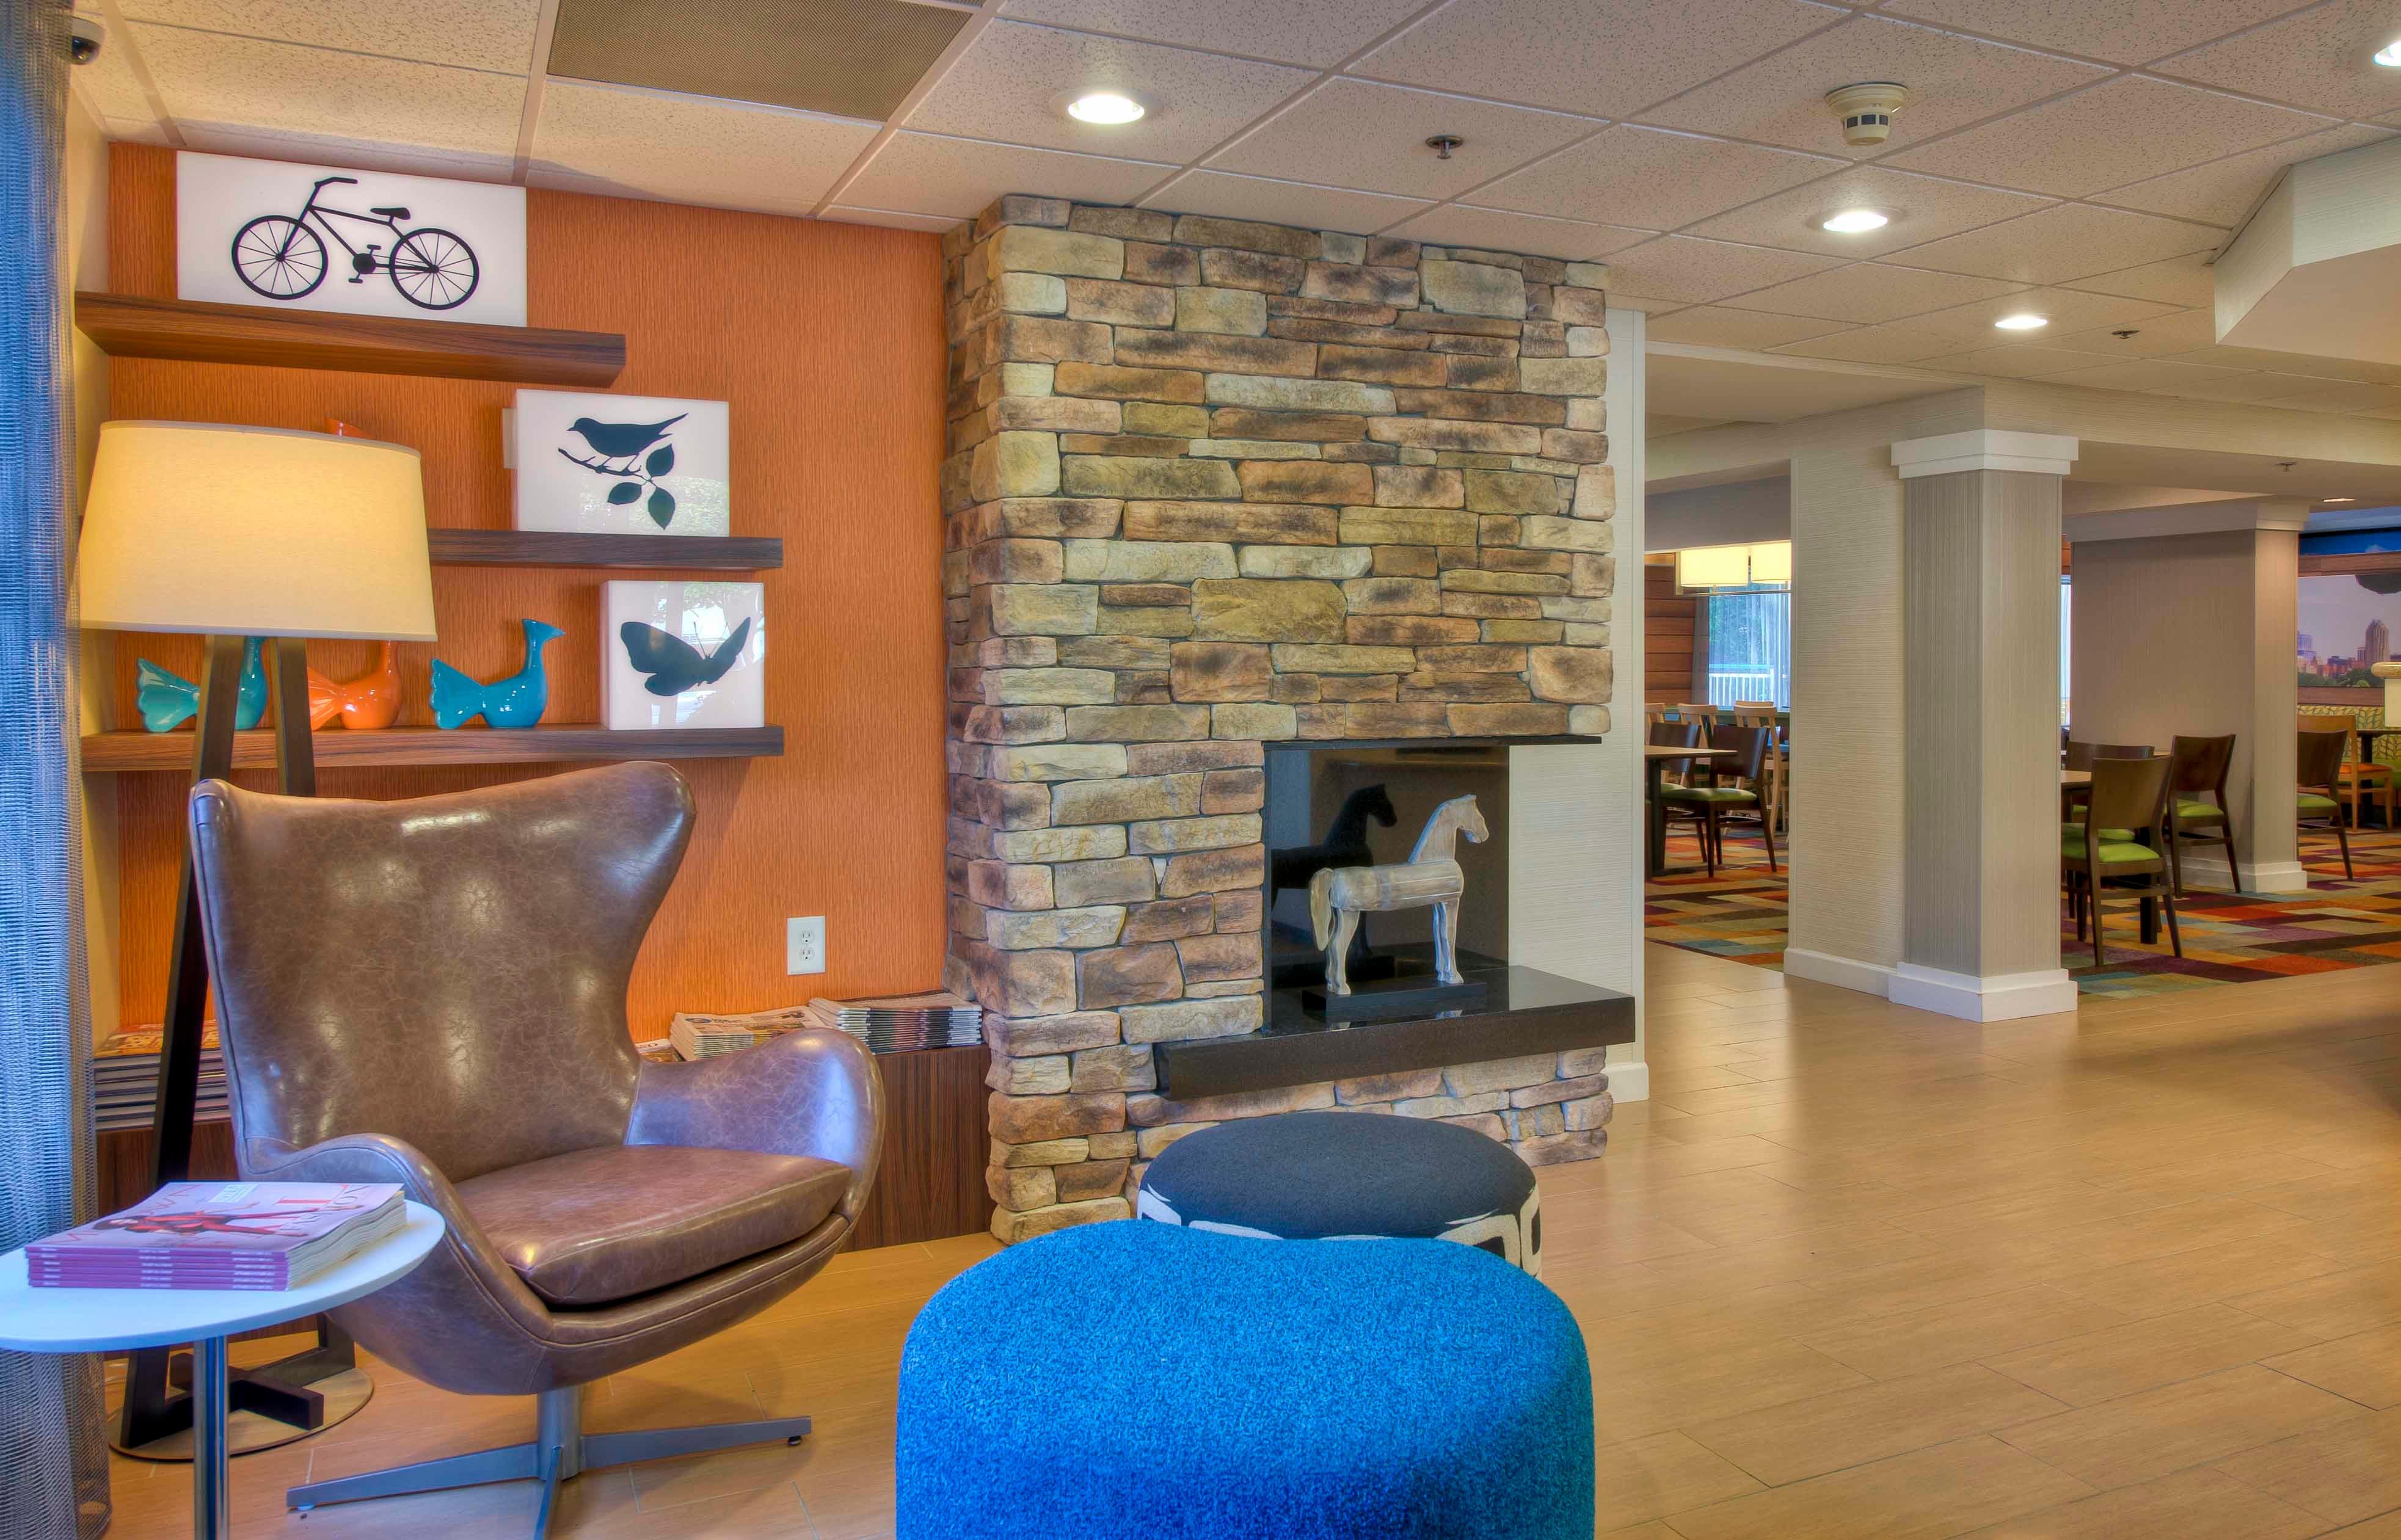 Fairfield Inn & Suites by Marriott Raleigh Crabtree Valley image 4